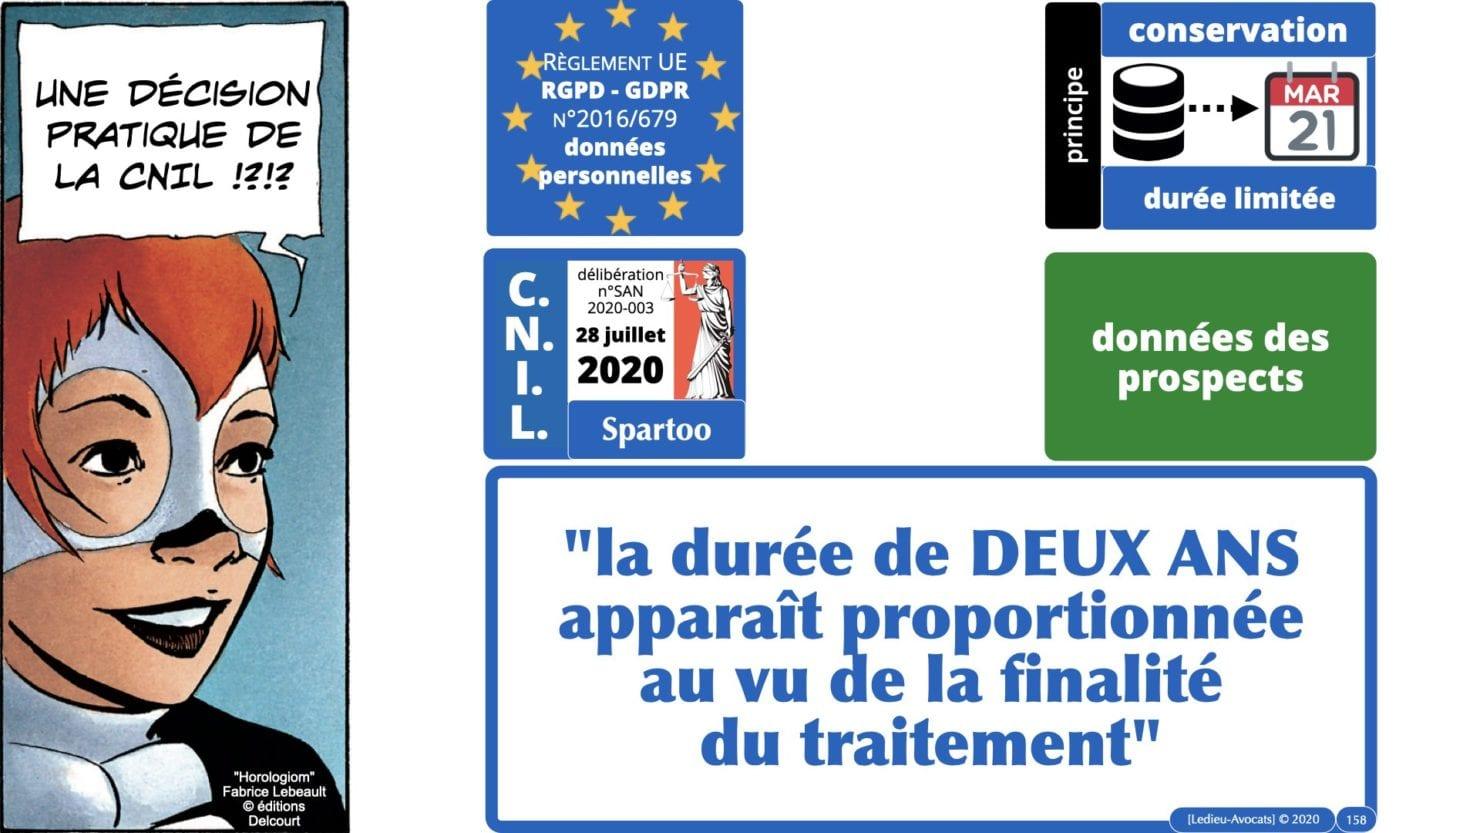 RGPD e-Privacy principes actualité jurisprudence ©Ledieu-Avocats 25-06-2021.158